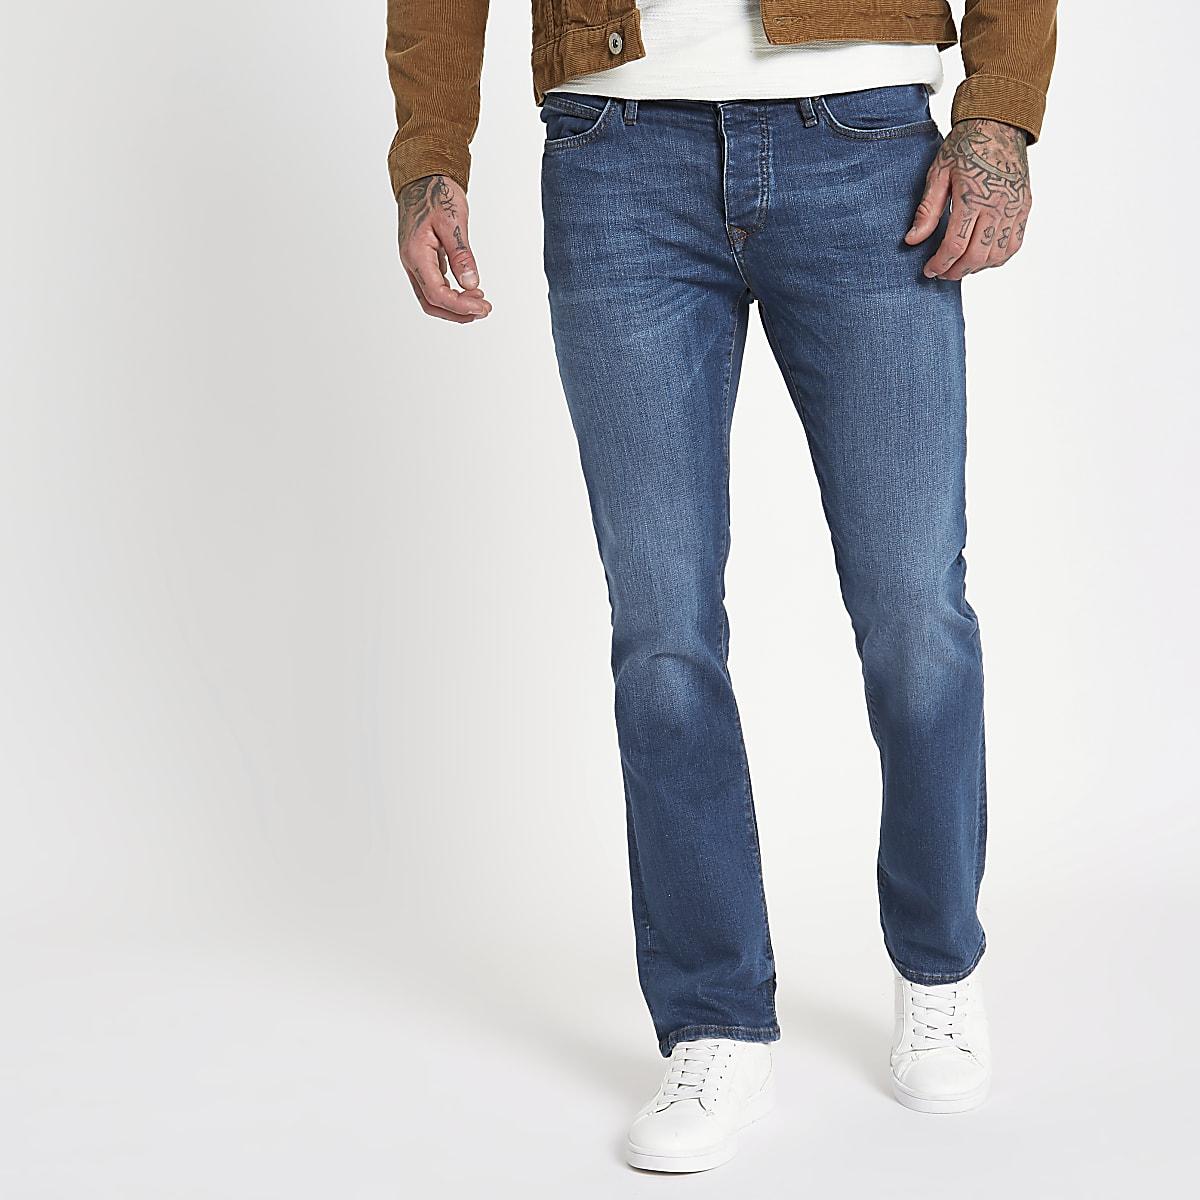 Clint - Bootcut Jeans in Blau